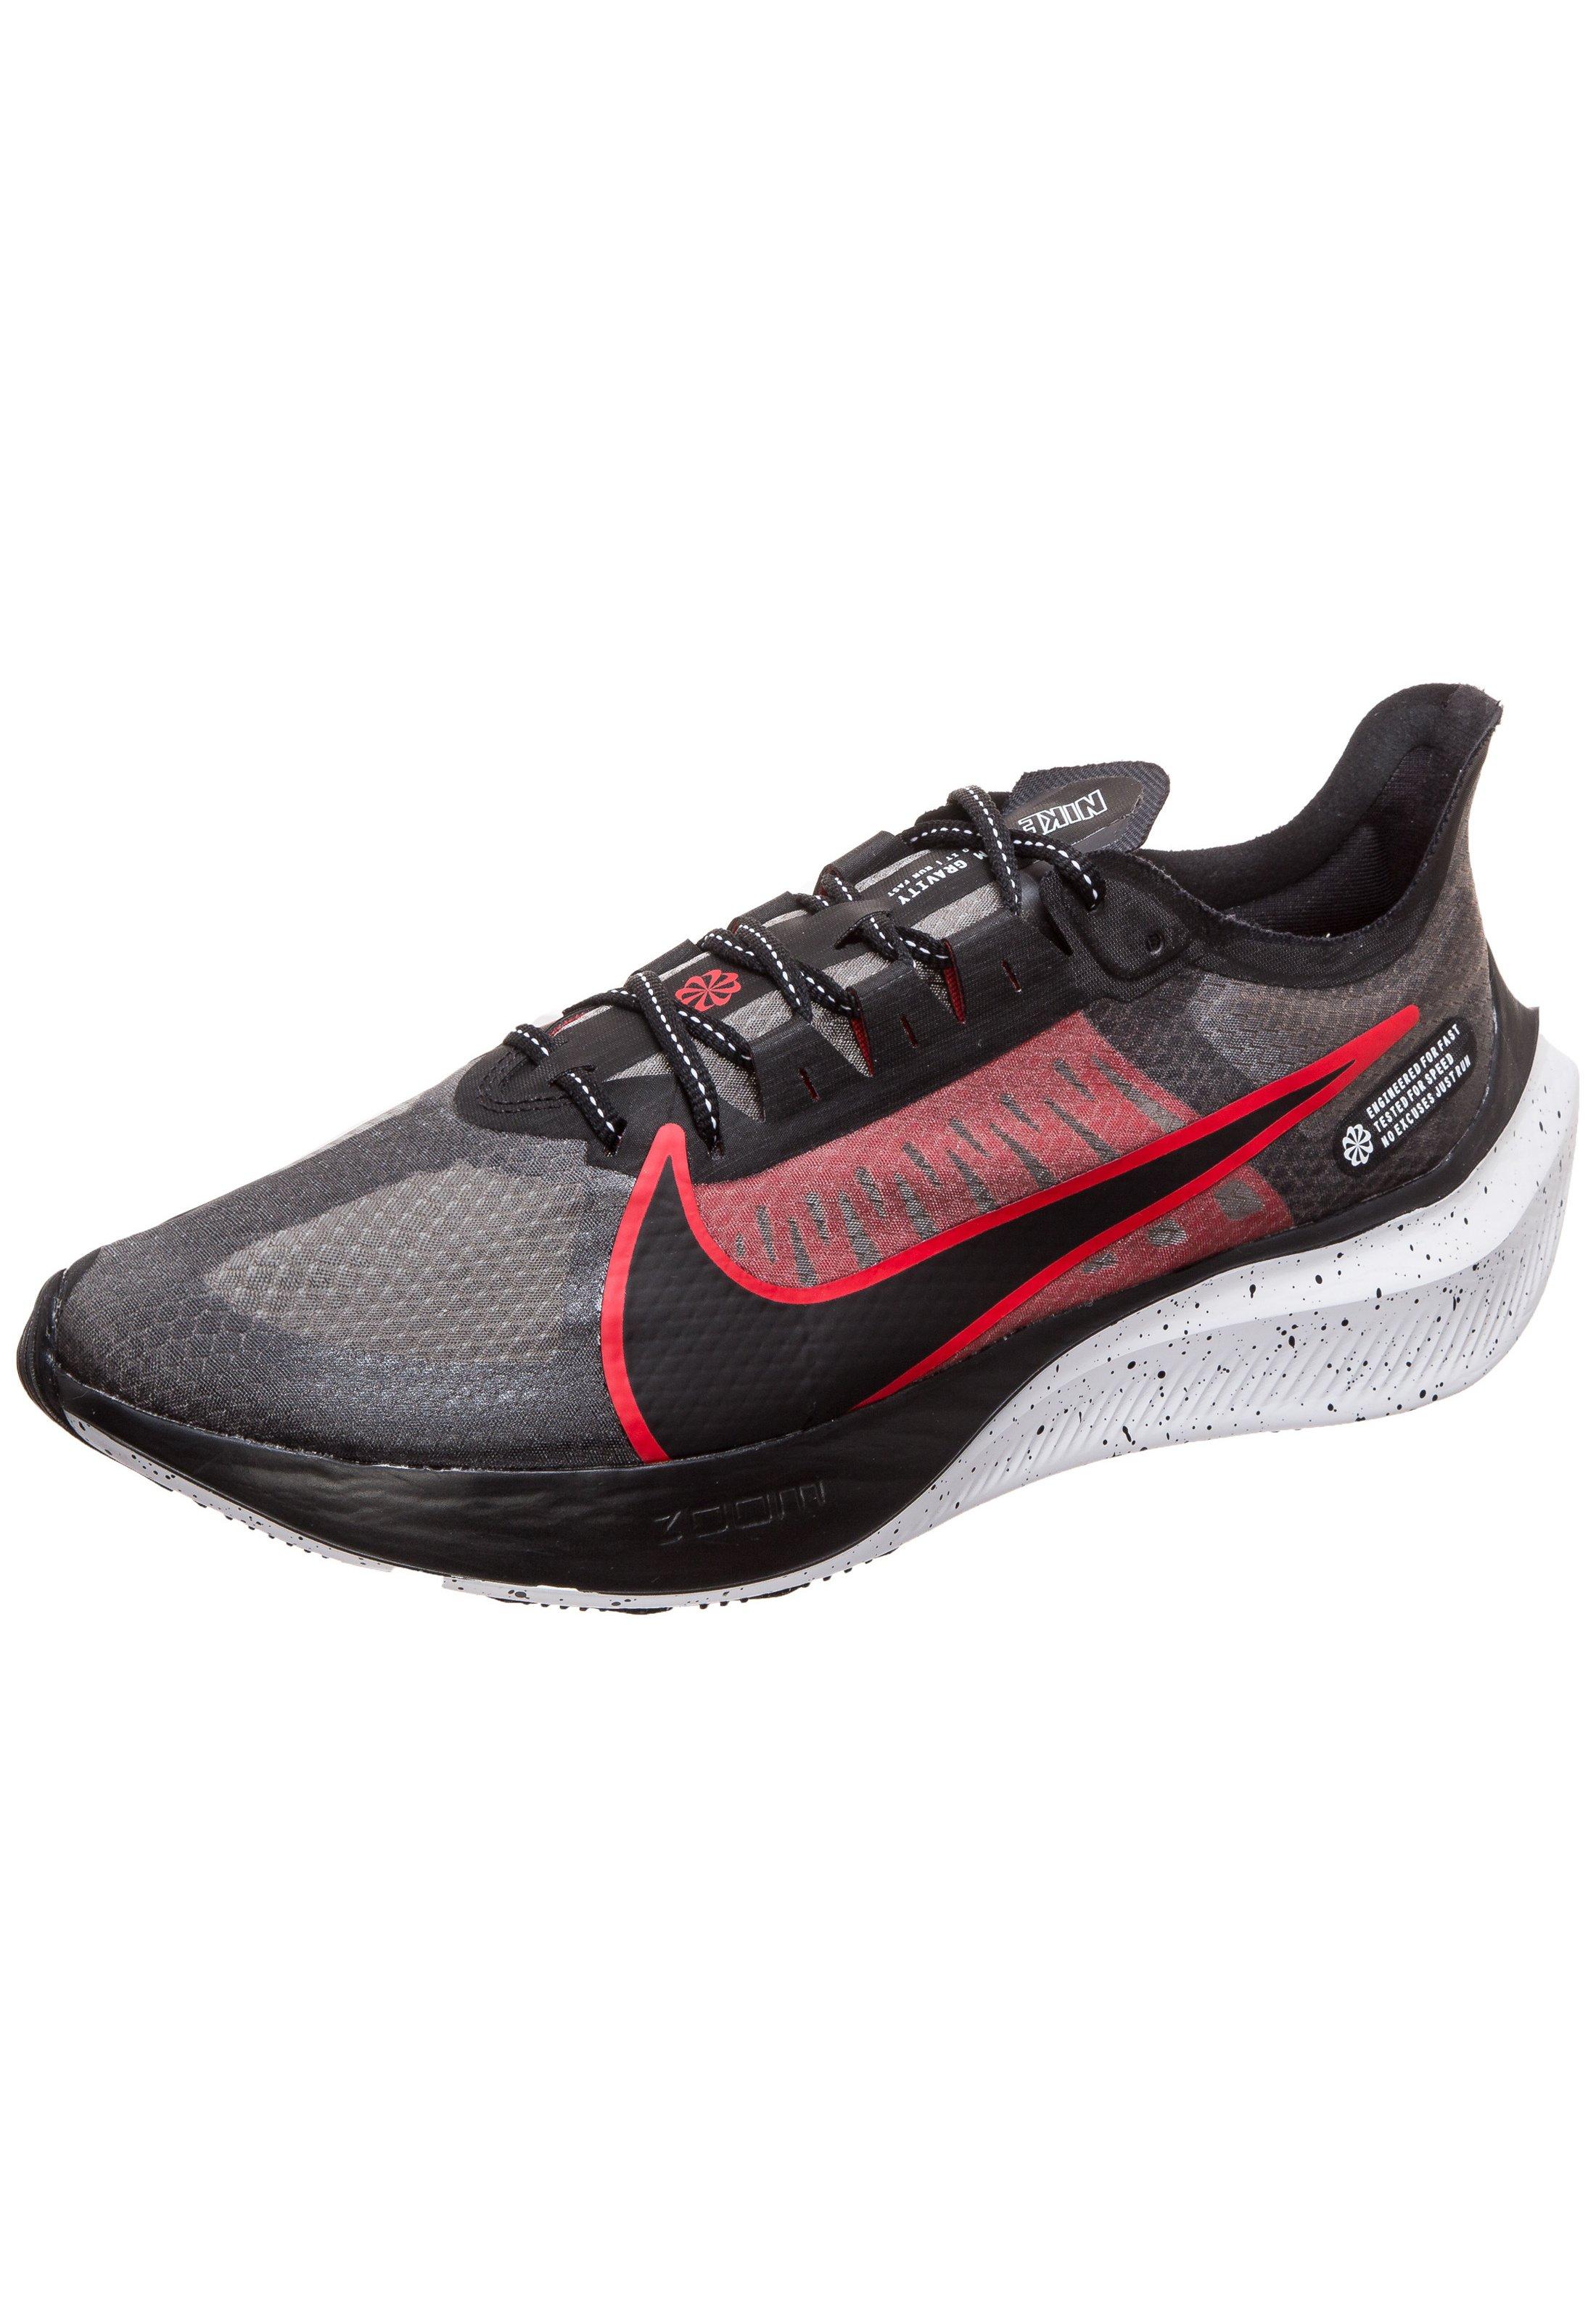 Nike Performance ZOOM GRAVITY LAUFSCHUH HERREN - Obuwie do biegania treningowe - black/red/white